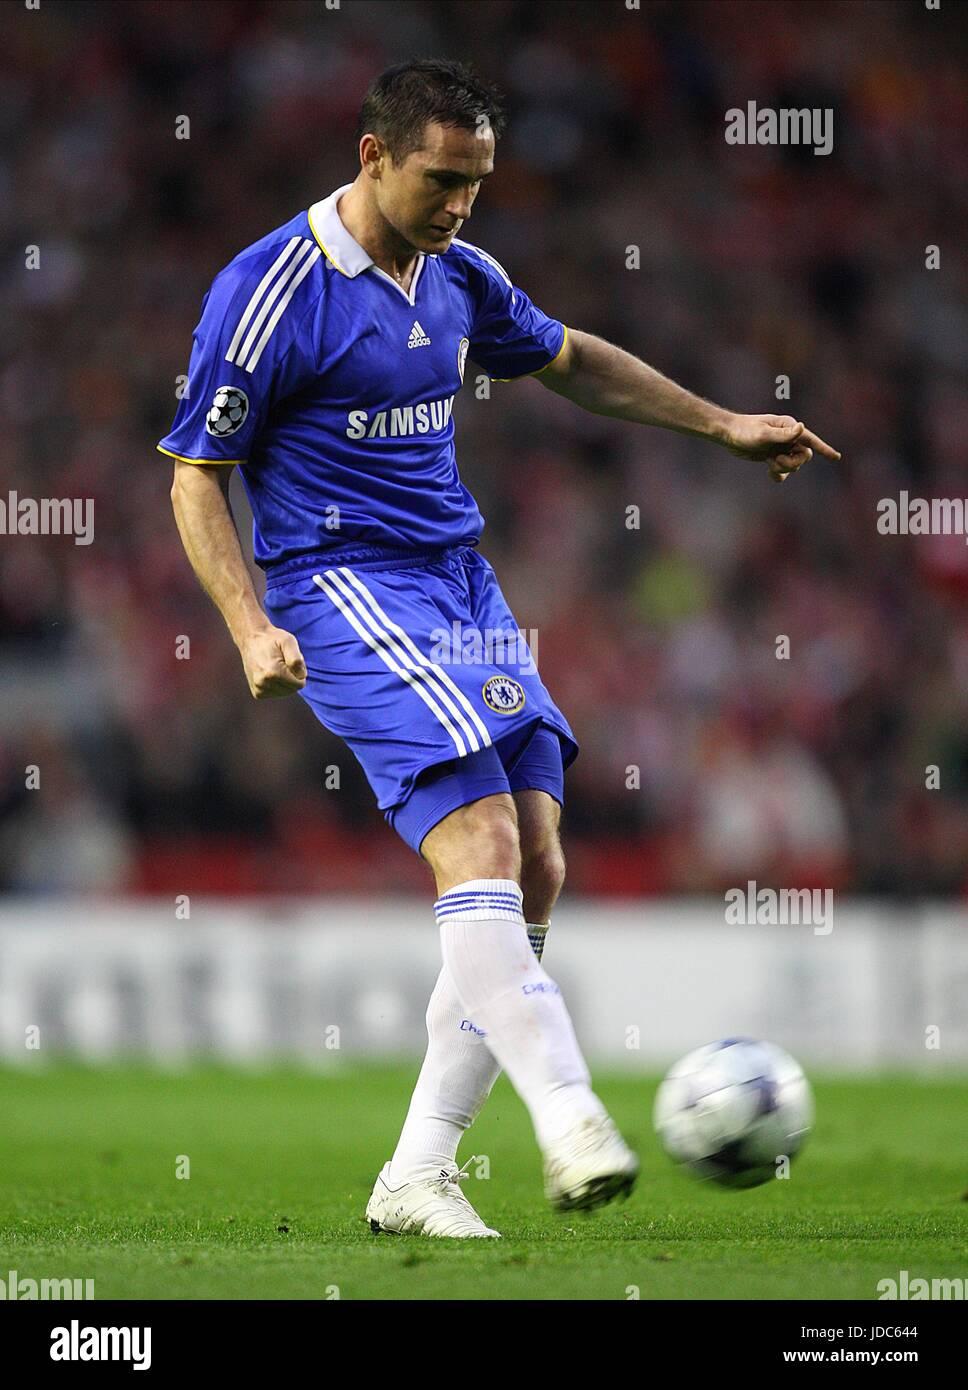 Frank Lampard 2009